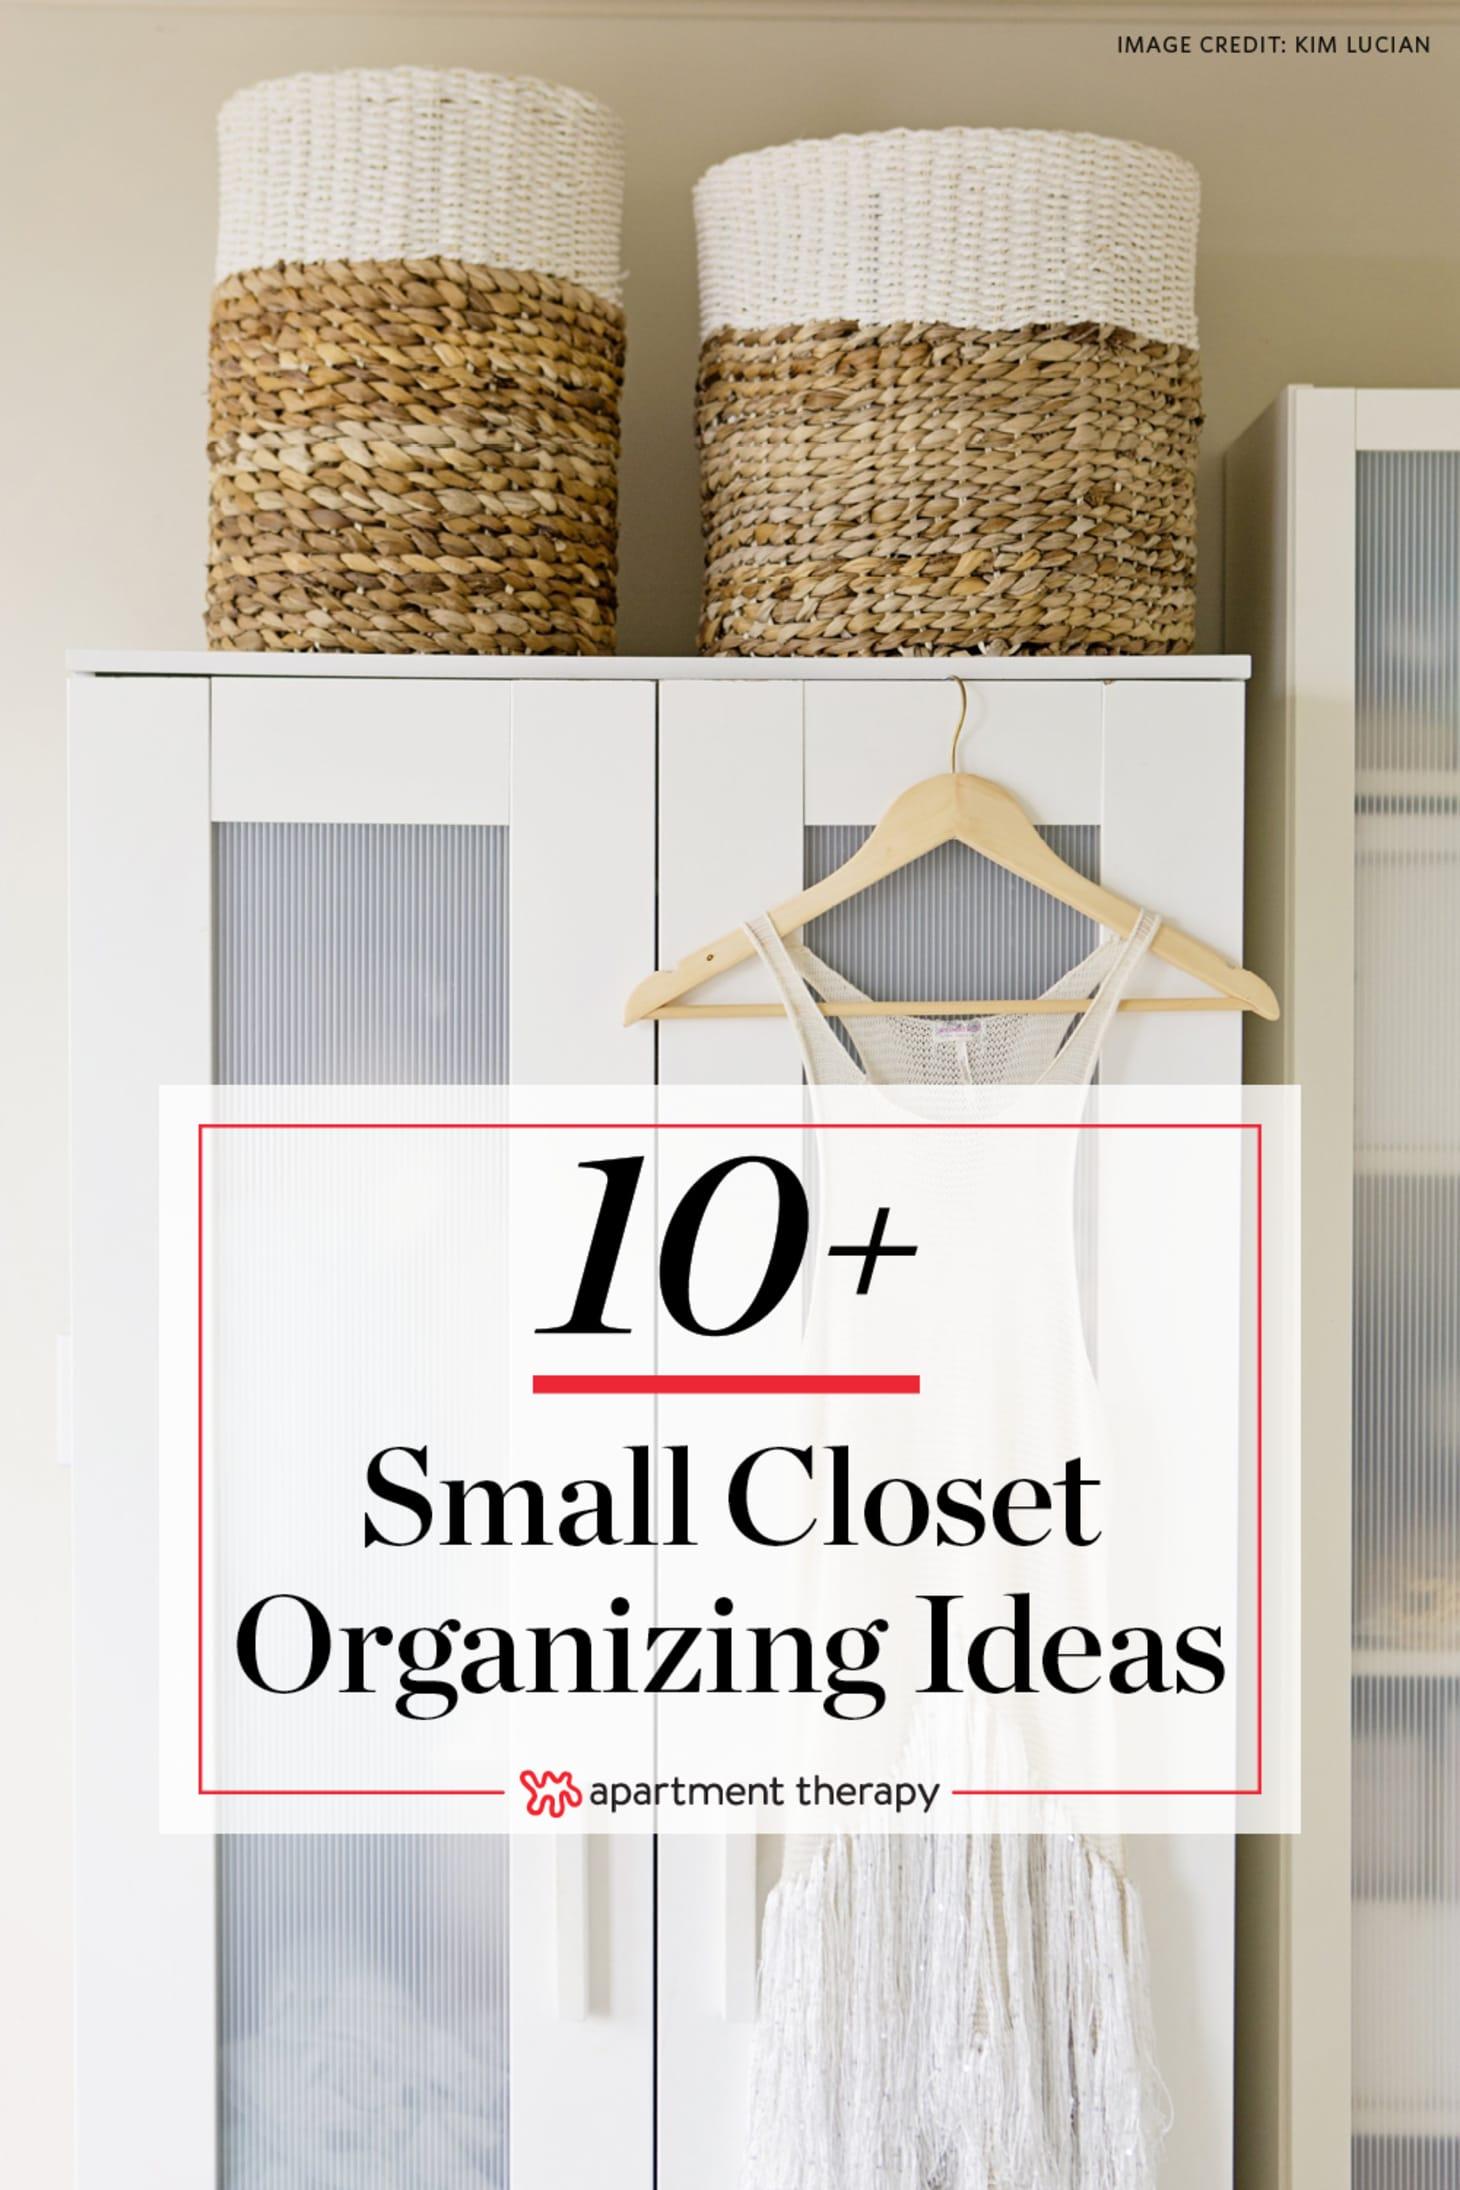 Peachy Closet Storage Ideas Small Closet Organization Apartment Interior Design Ideas Oteneahmetsinanyavuzinfo